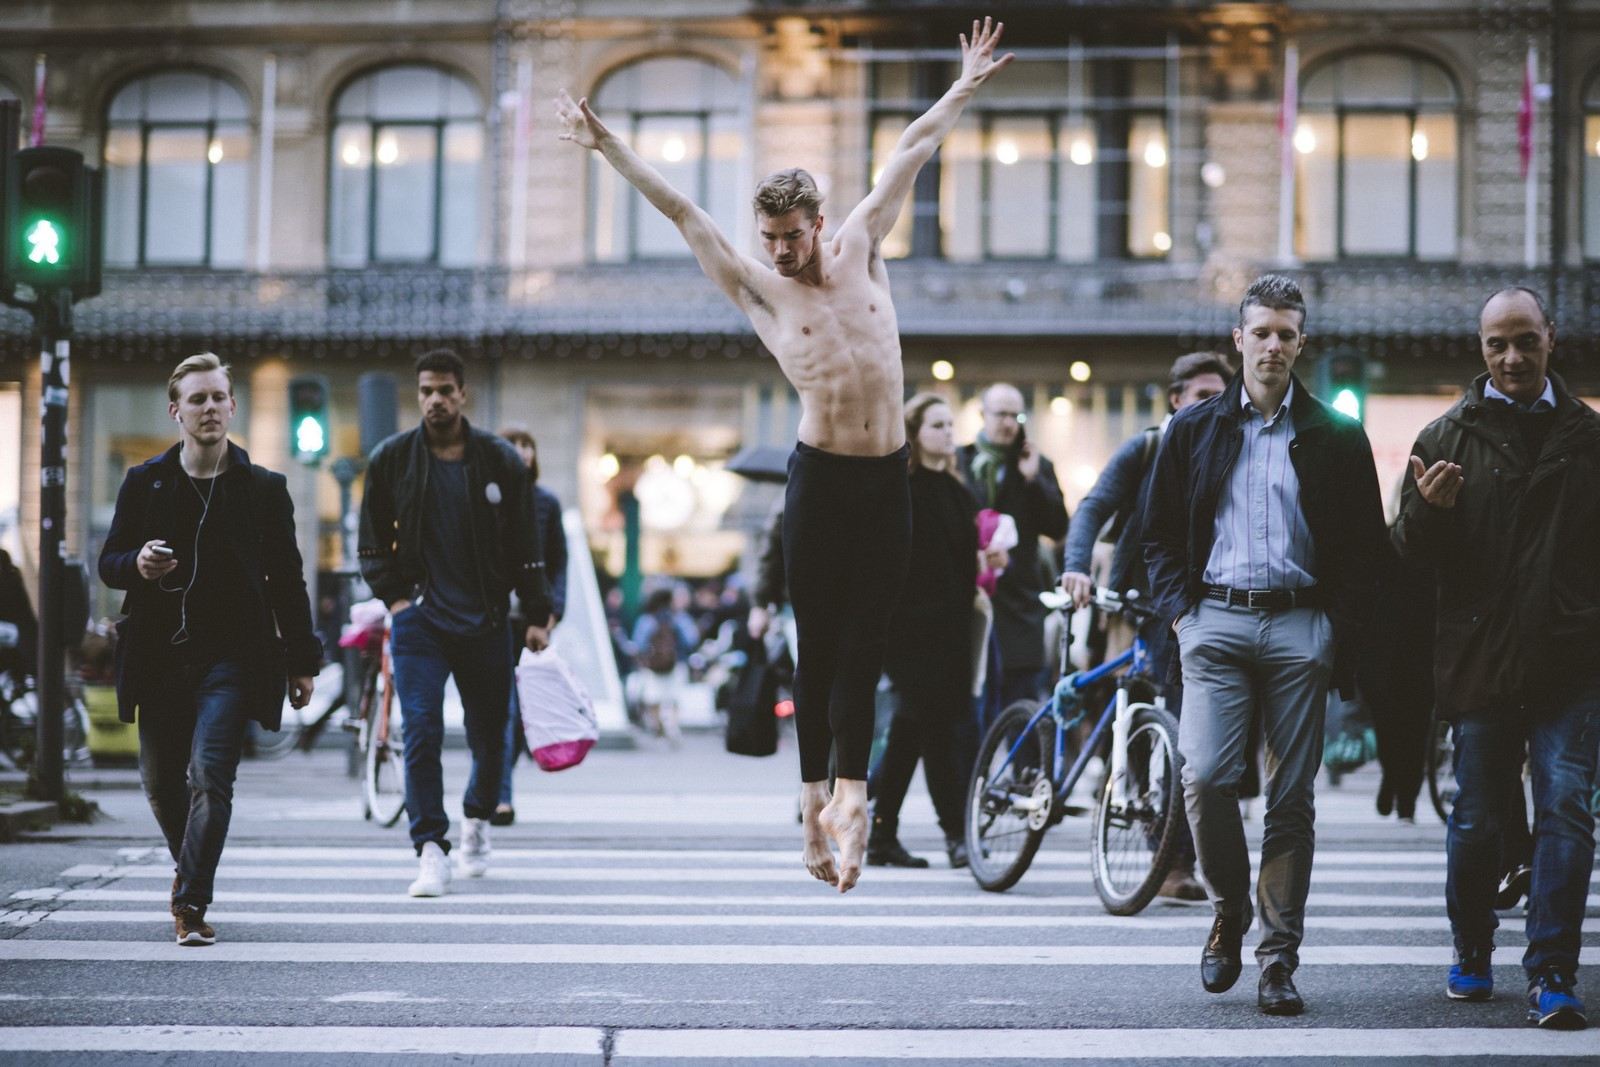 Teaterblik: Talk: Hvordan sikrer vi et større ejerskab for balletten?, Det Kongelige Teater